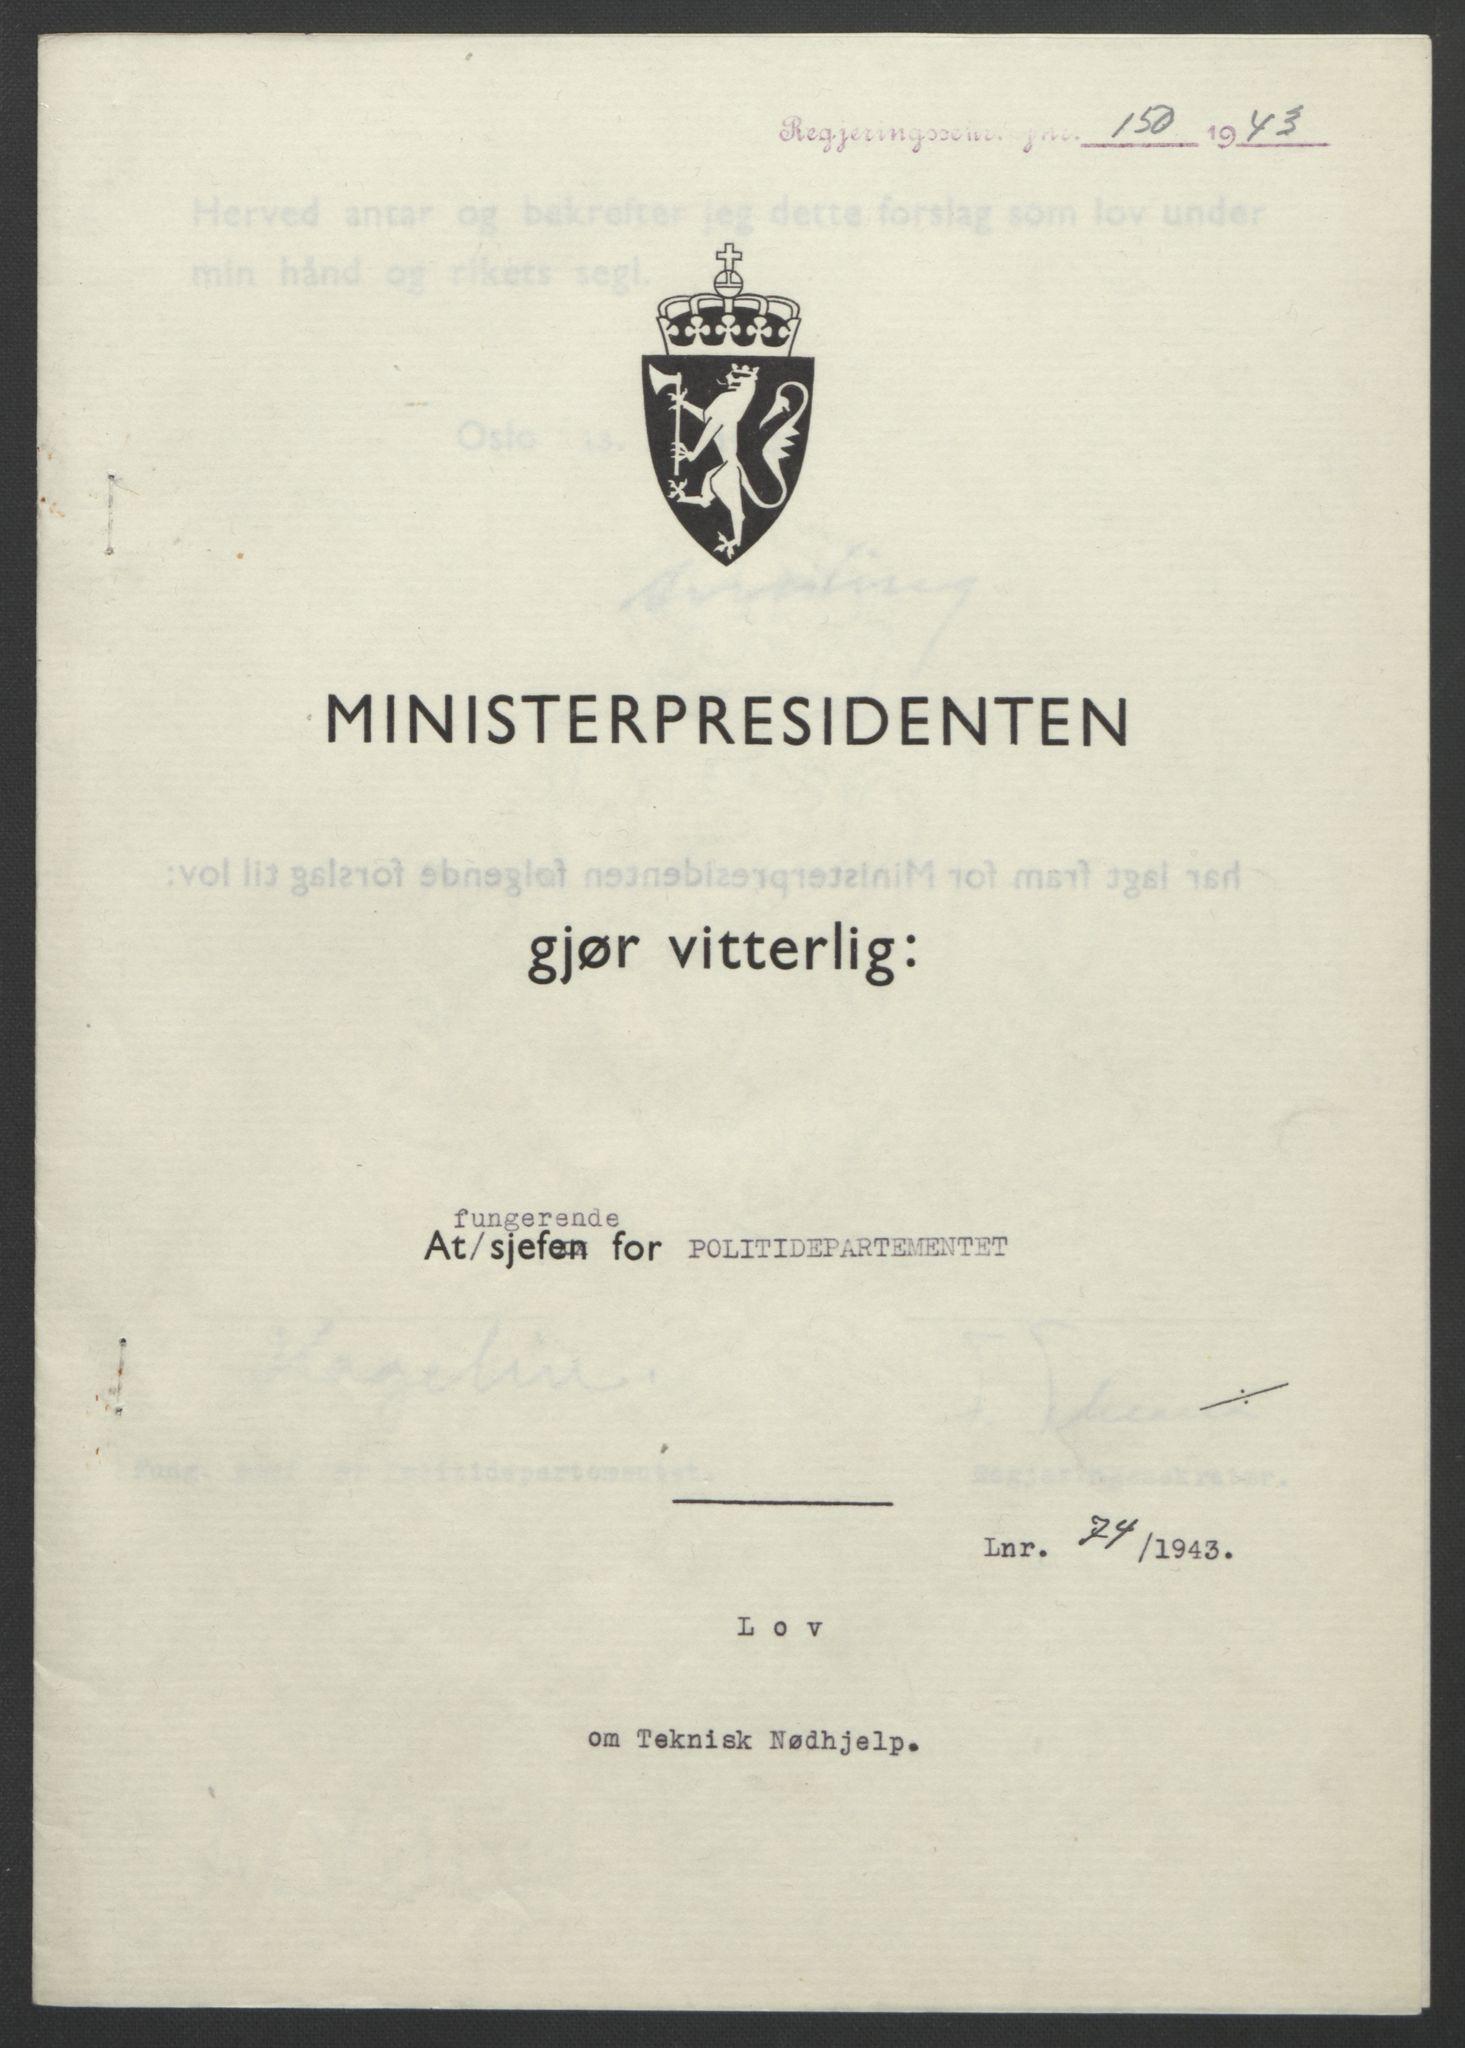 RA, NS-administrasjonen 1940-1945 (Statsrådsekretariatet, de kommisariske statsråder mm), D/Db/L0099: Lover, 1943, s. 336